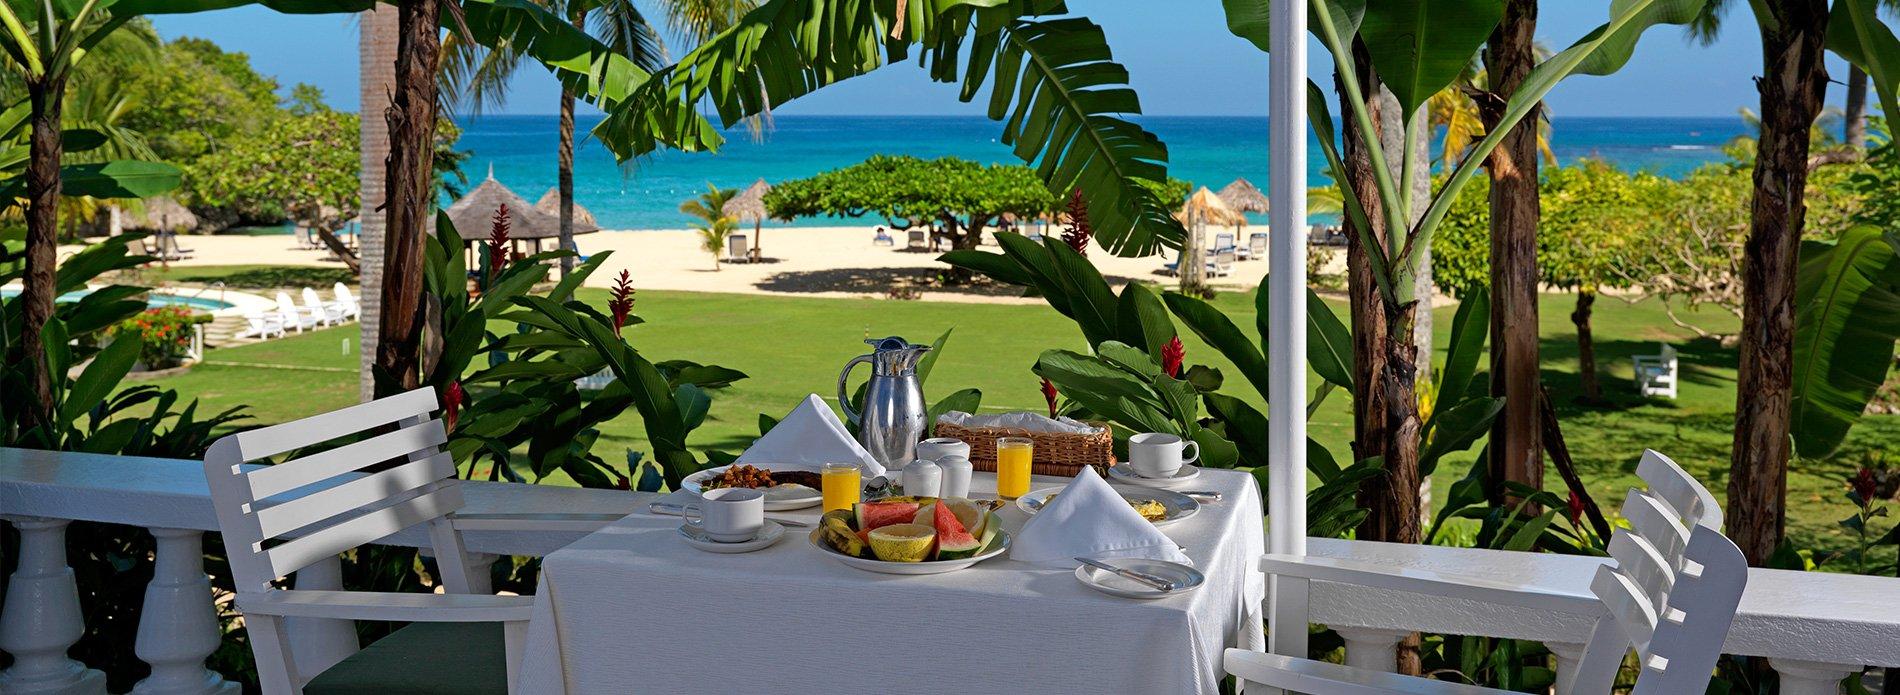 porch-breakfast-jamaica-inn